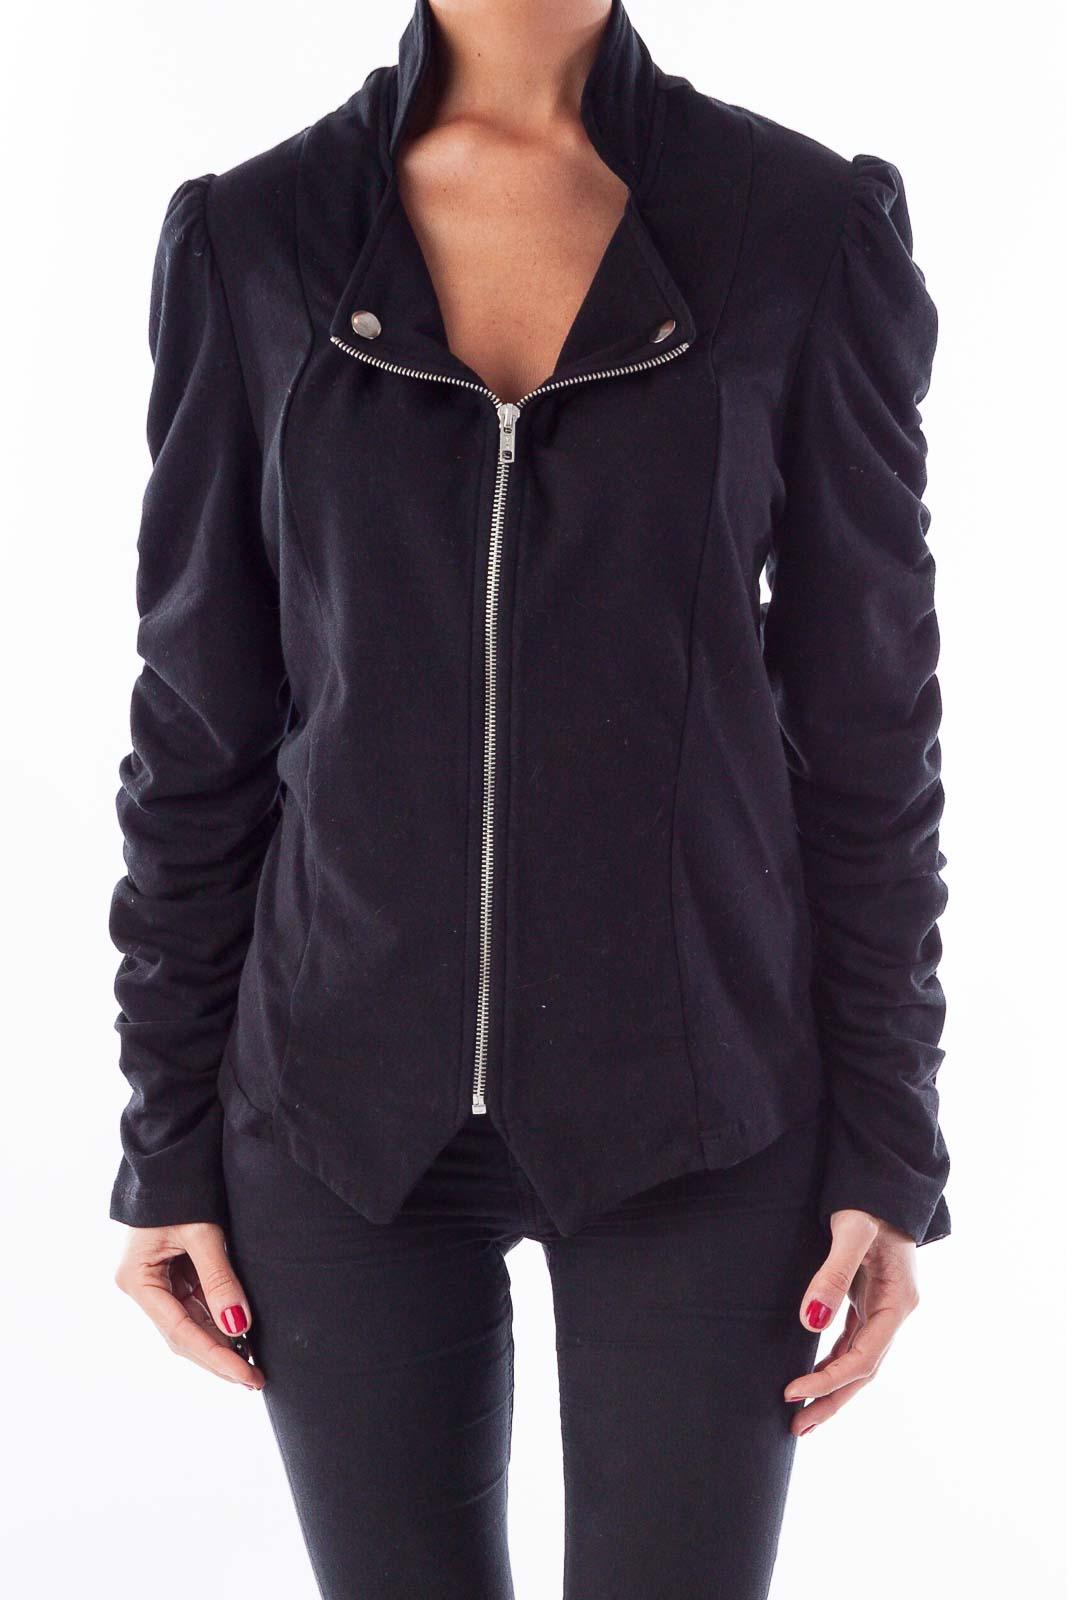 Black Zippered Jacket Front